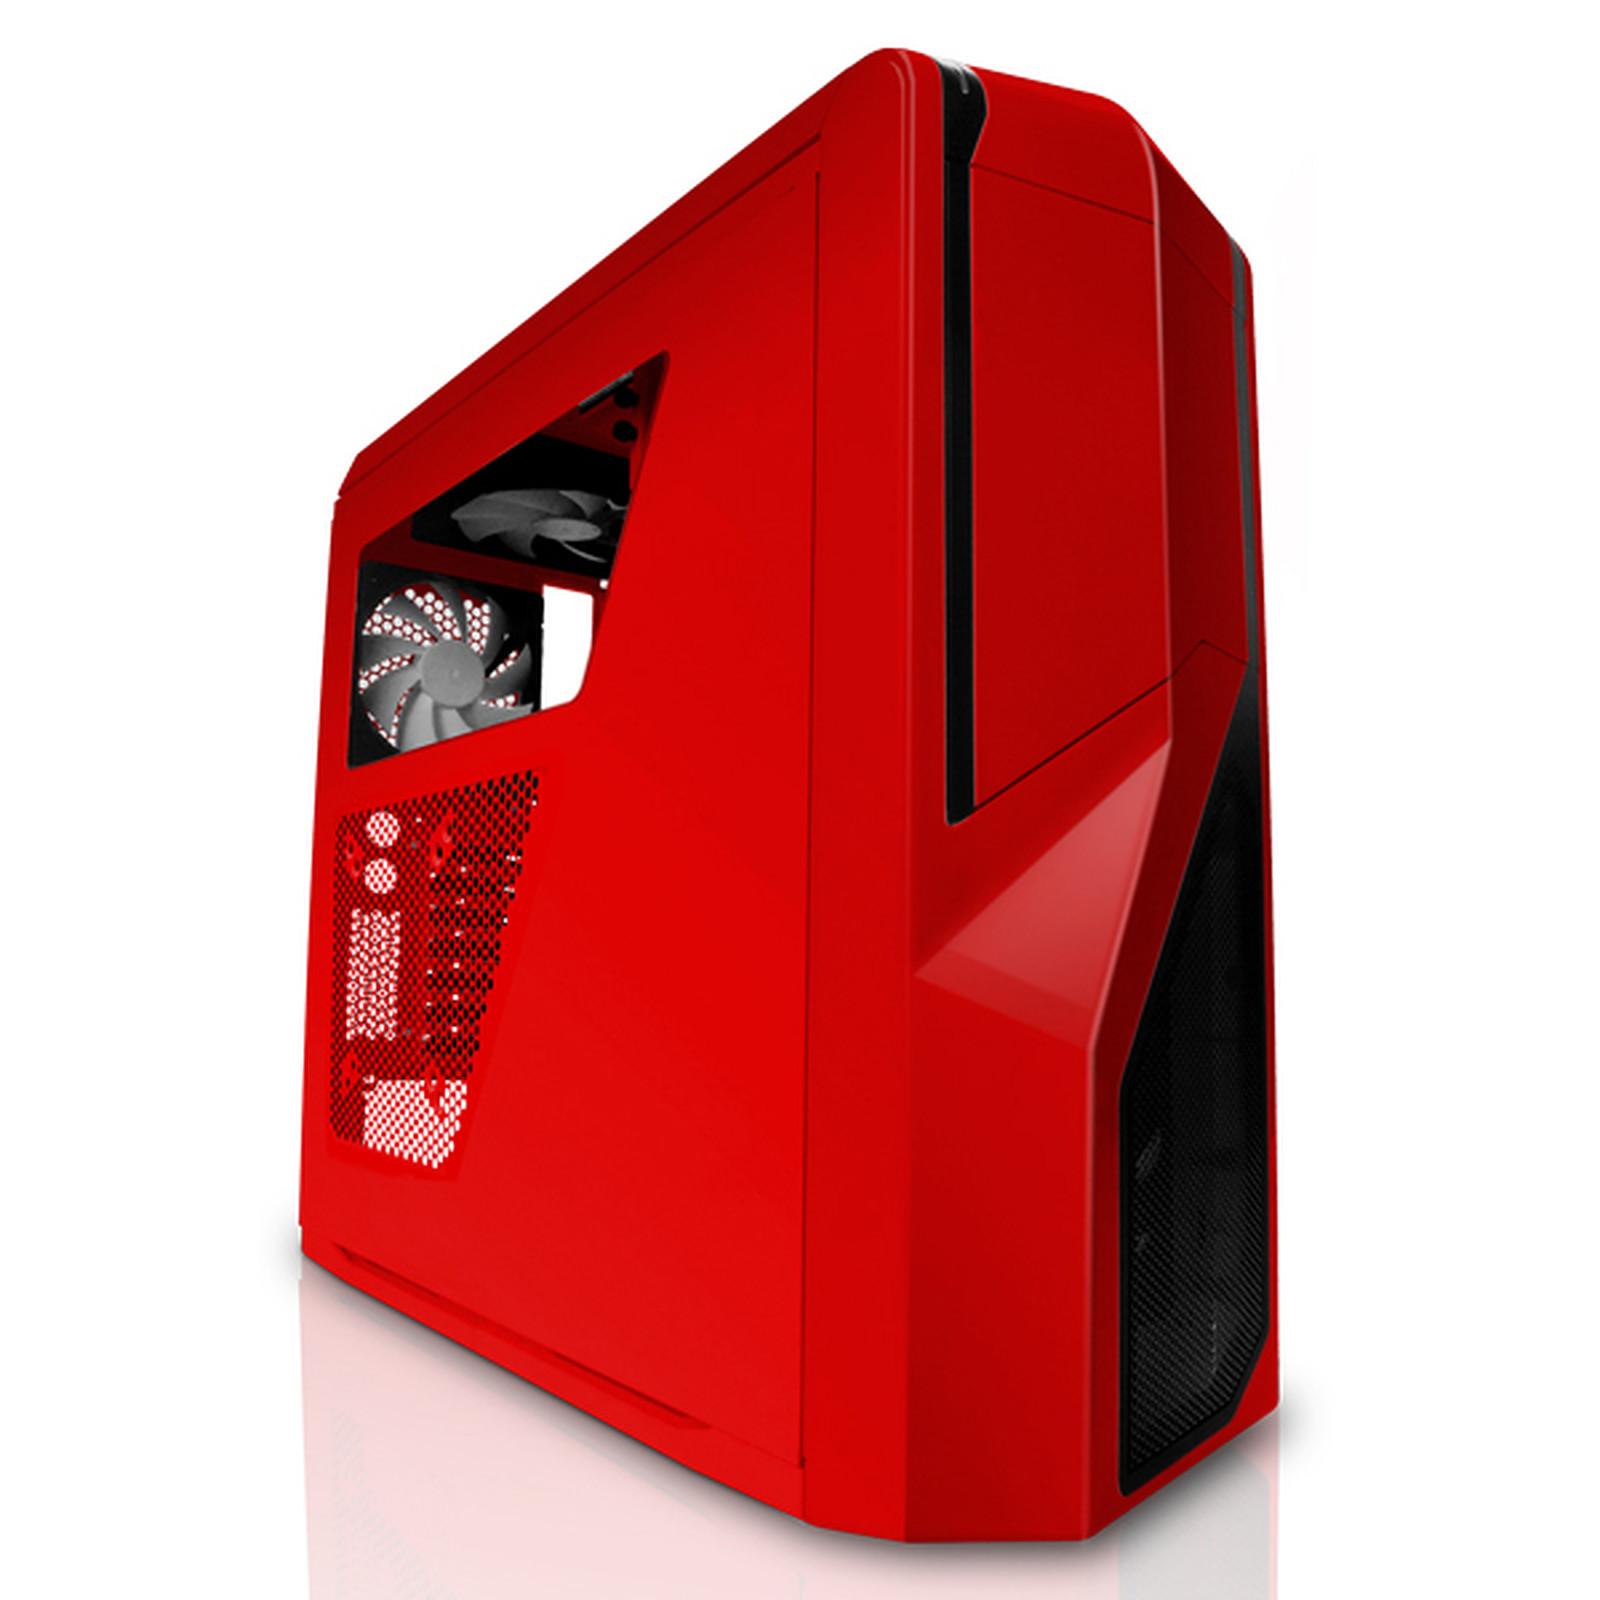 NZXT Phantom 410 (rouge) - Edition USB 3.0